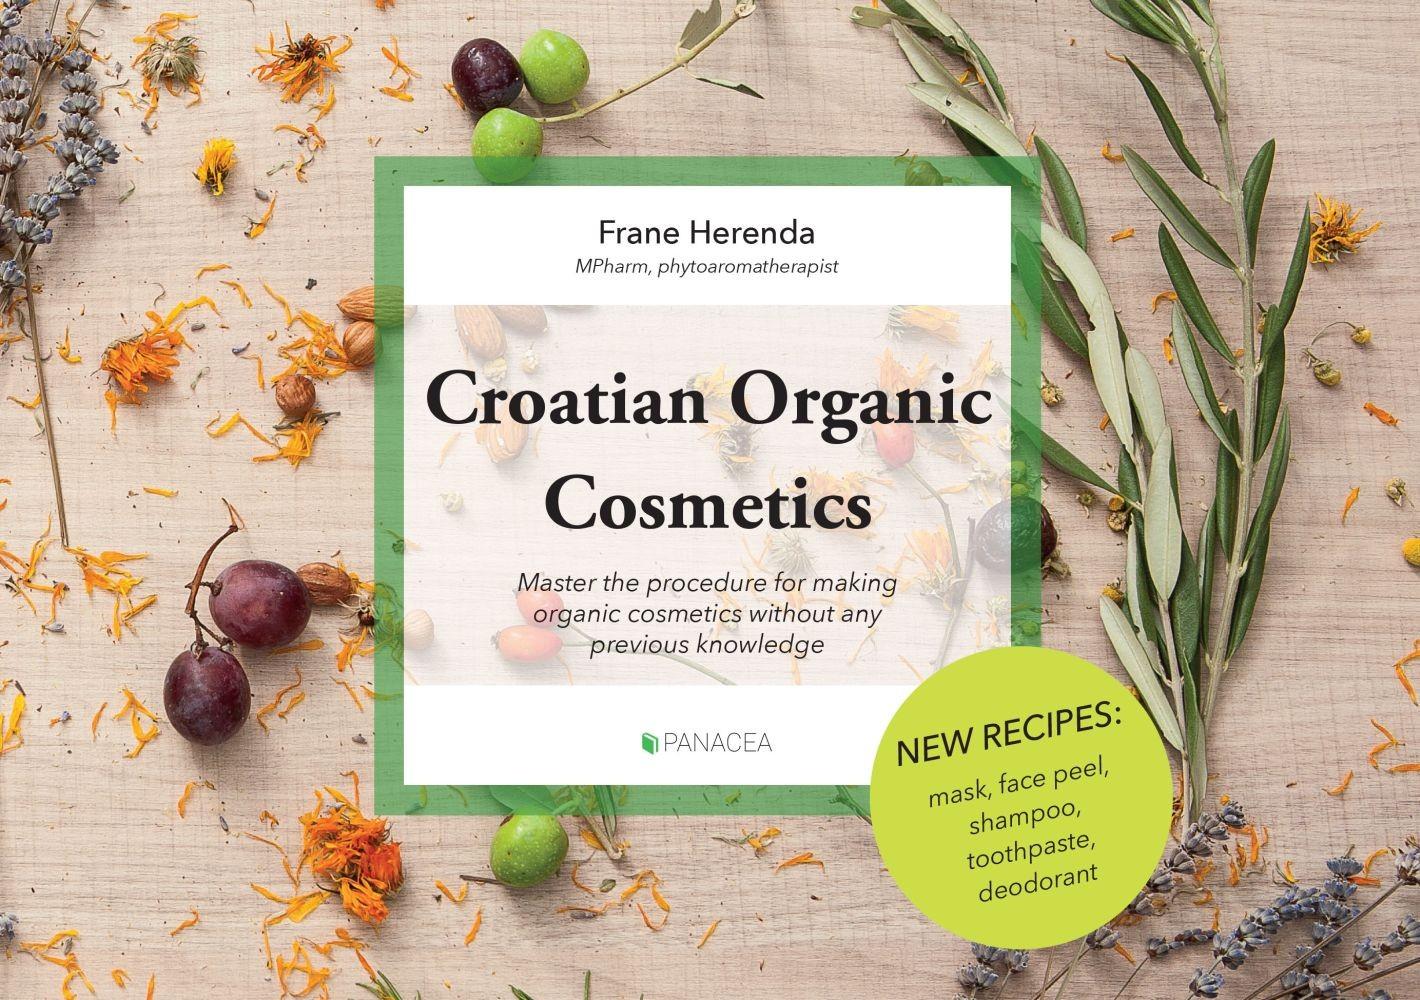 Croatian Organic Cosmetics